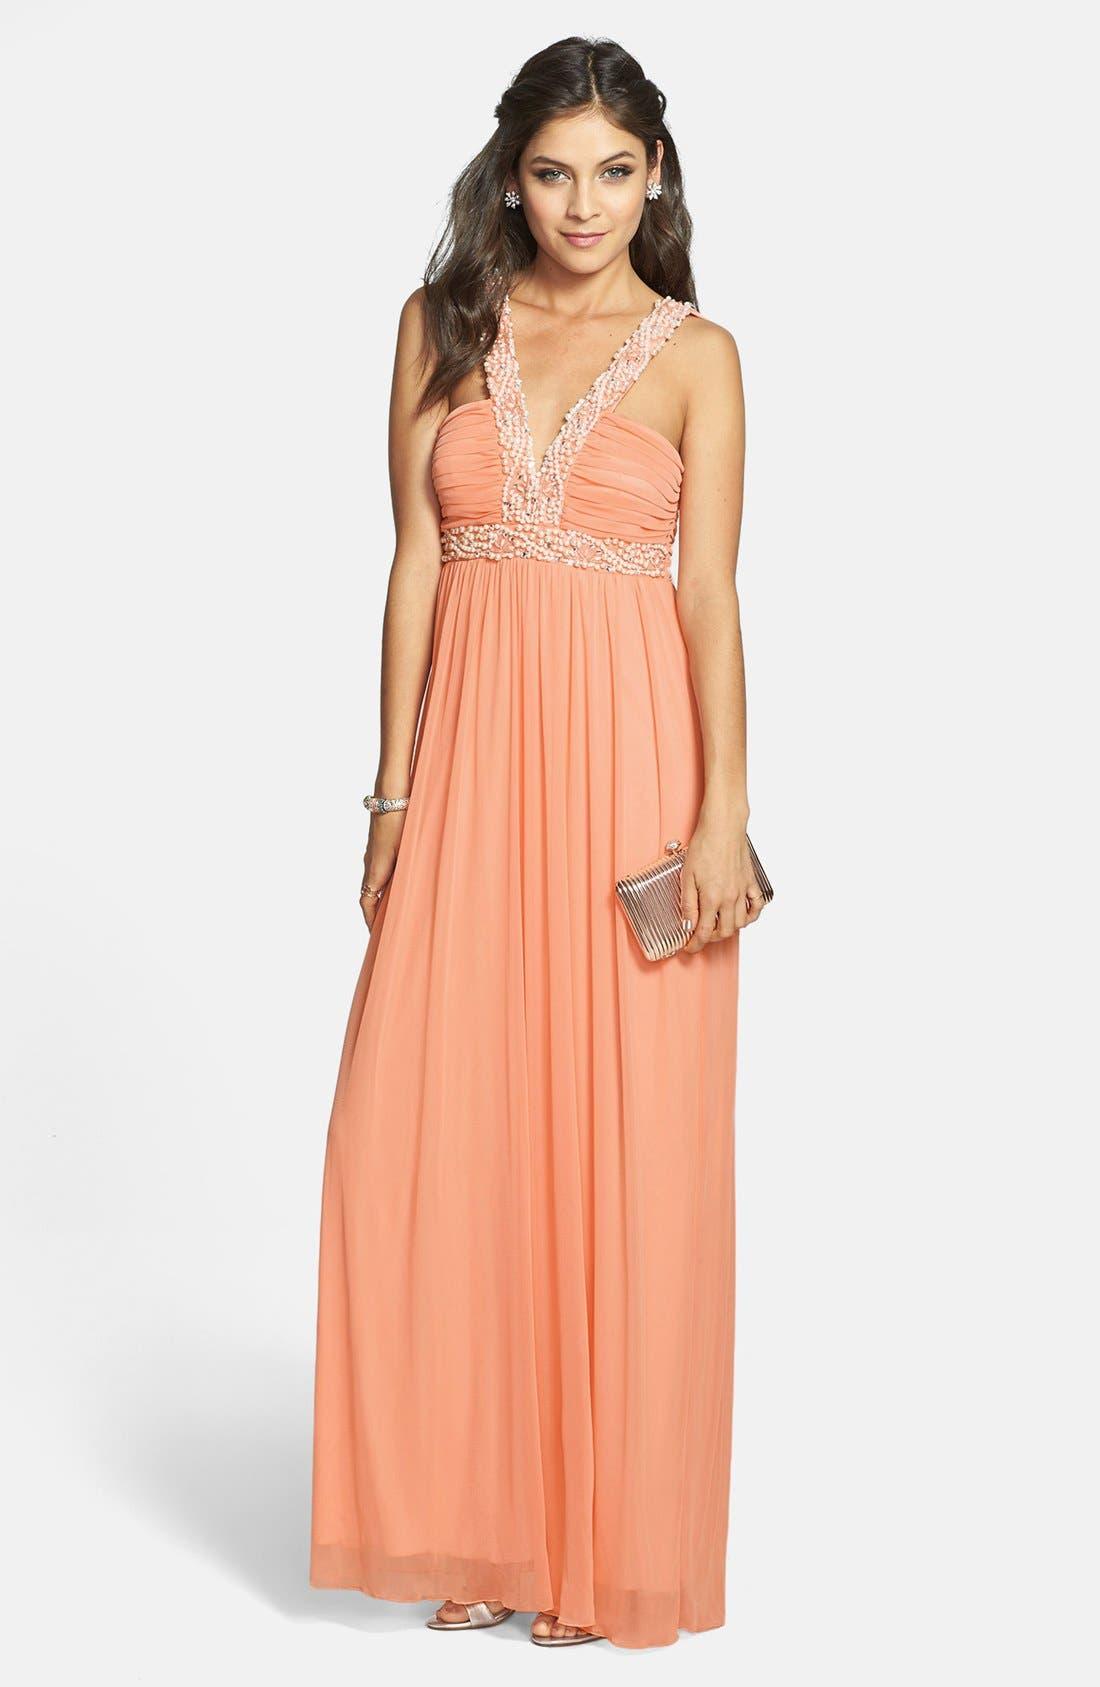 Alternate Image 1 Selected - Way-In Embellished V-Neck Gown (Juniors) (Online Only)